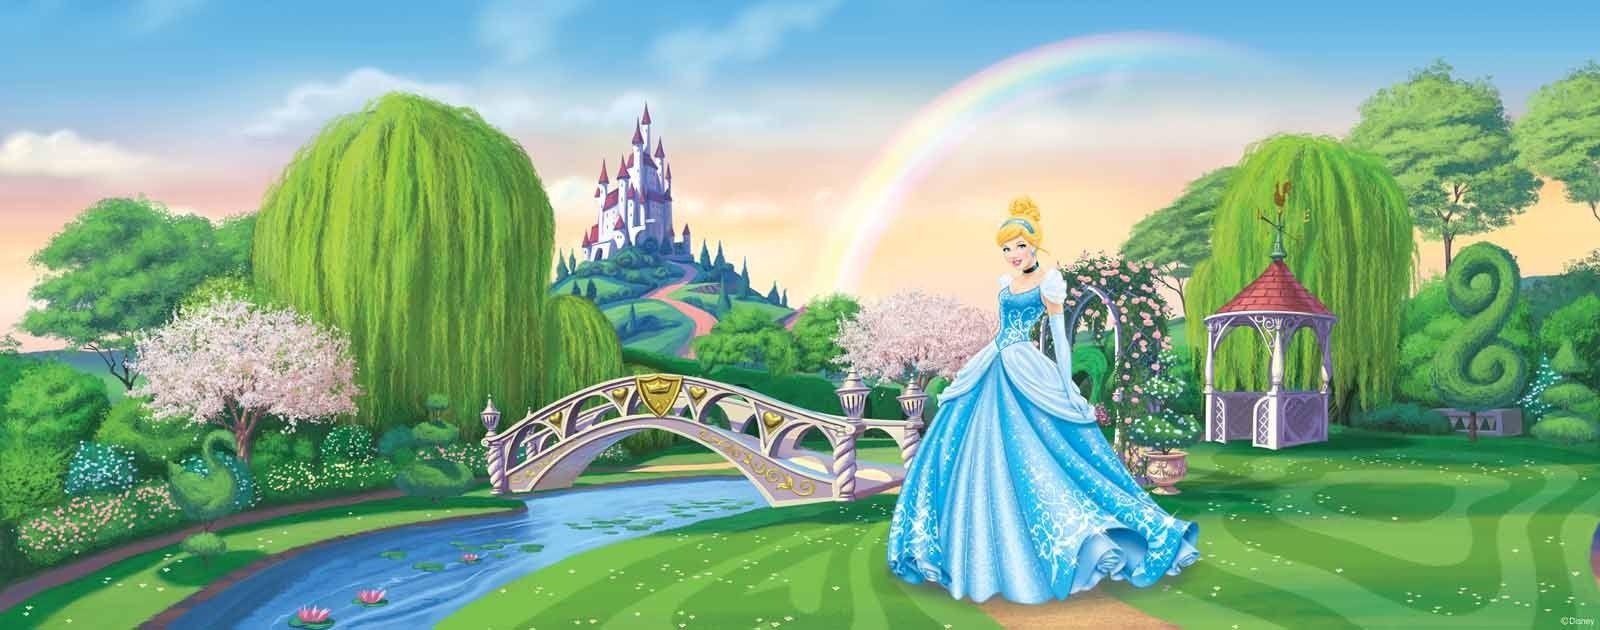 princess castle background google search rooms pinterest